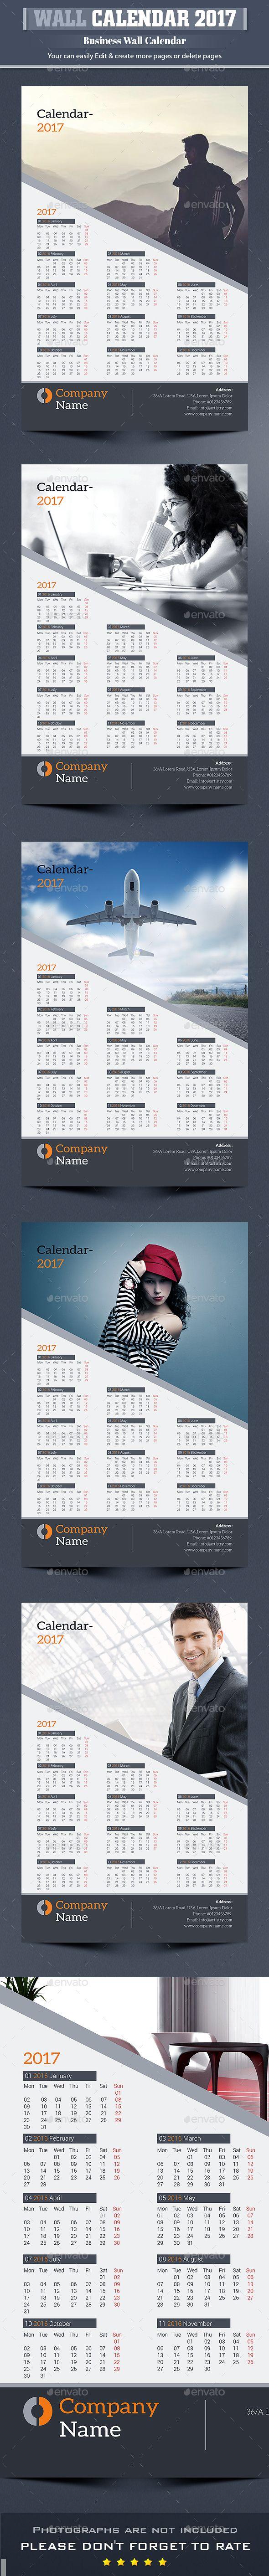 Wall Calendar 2017 Template InDesign INDD | Calendar Templates ...